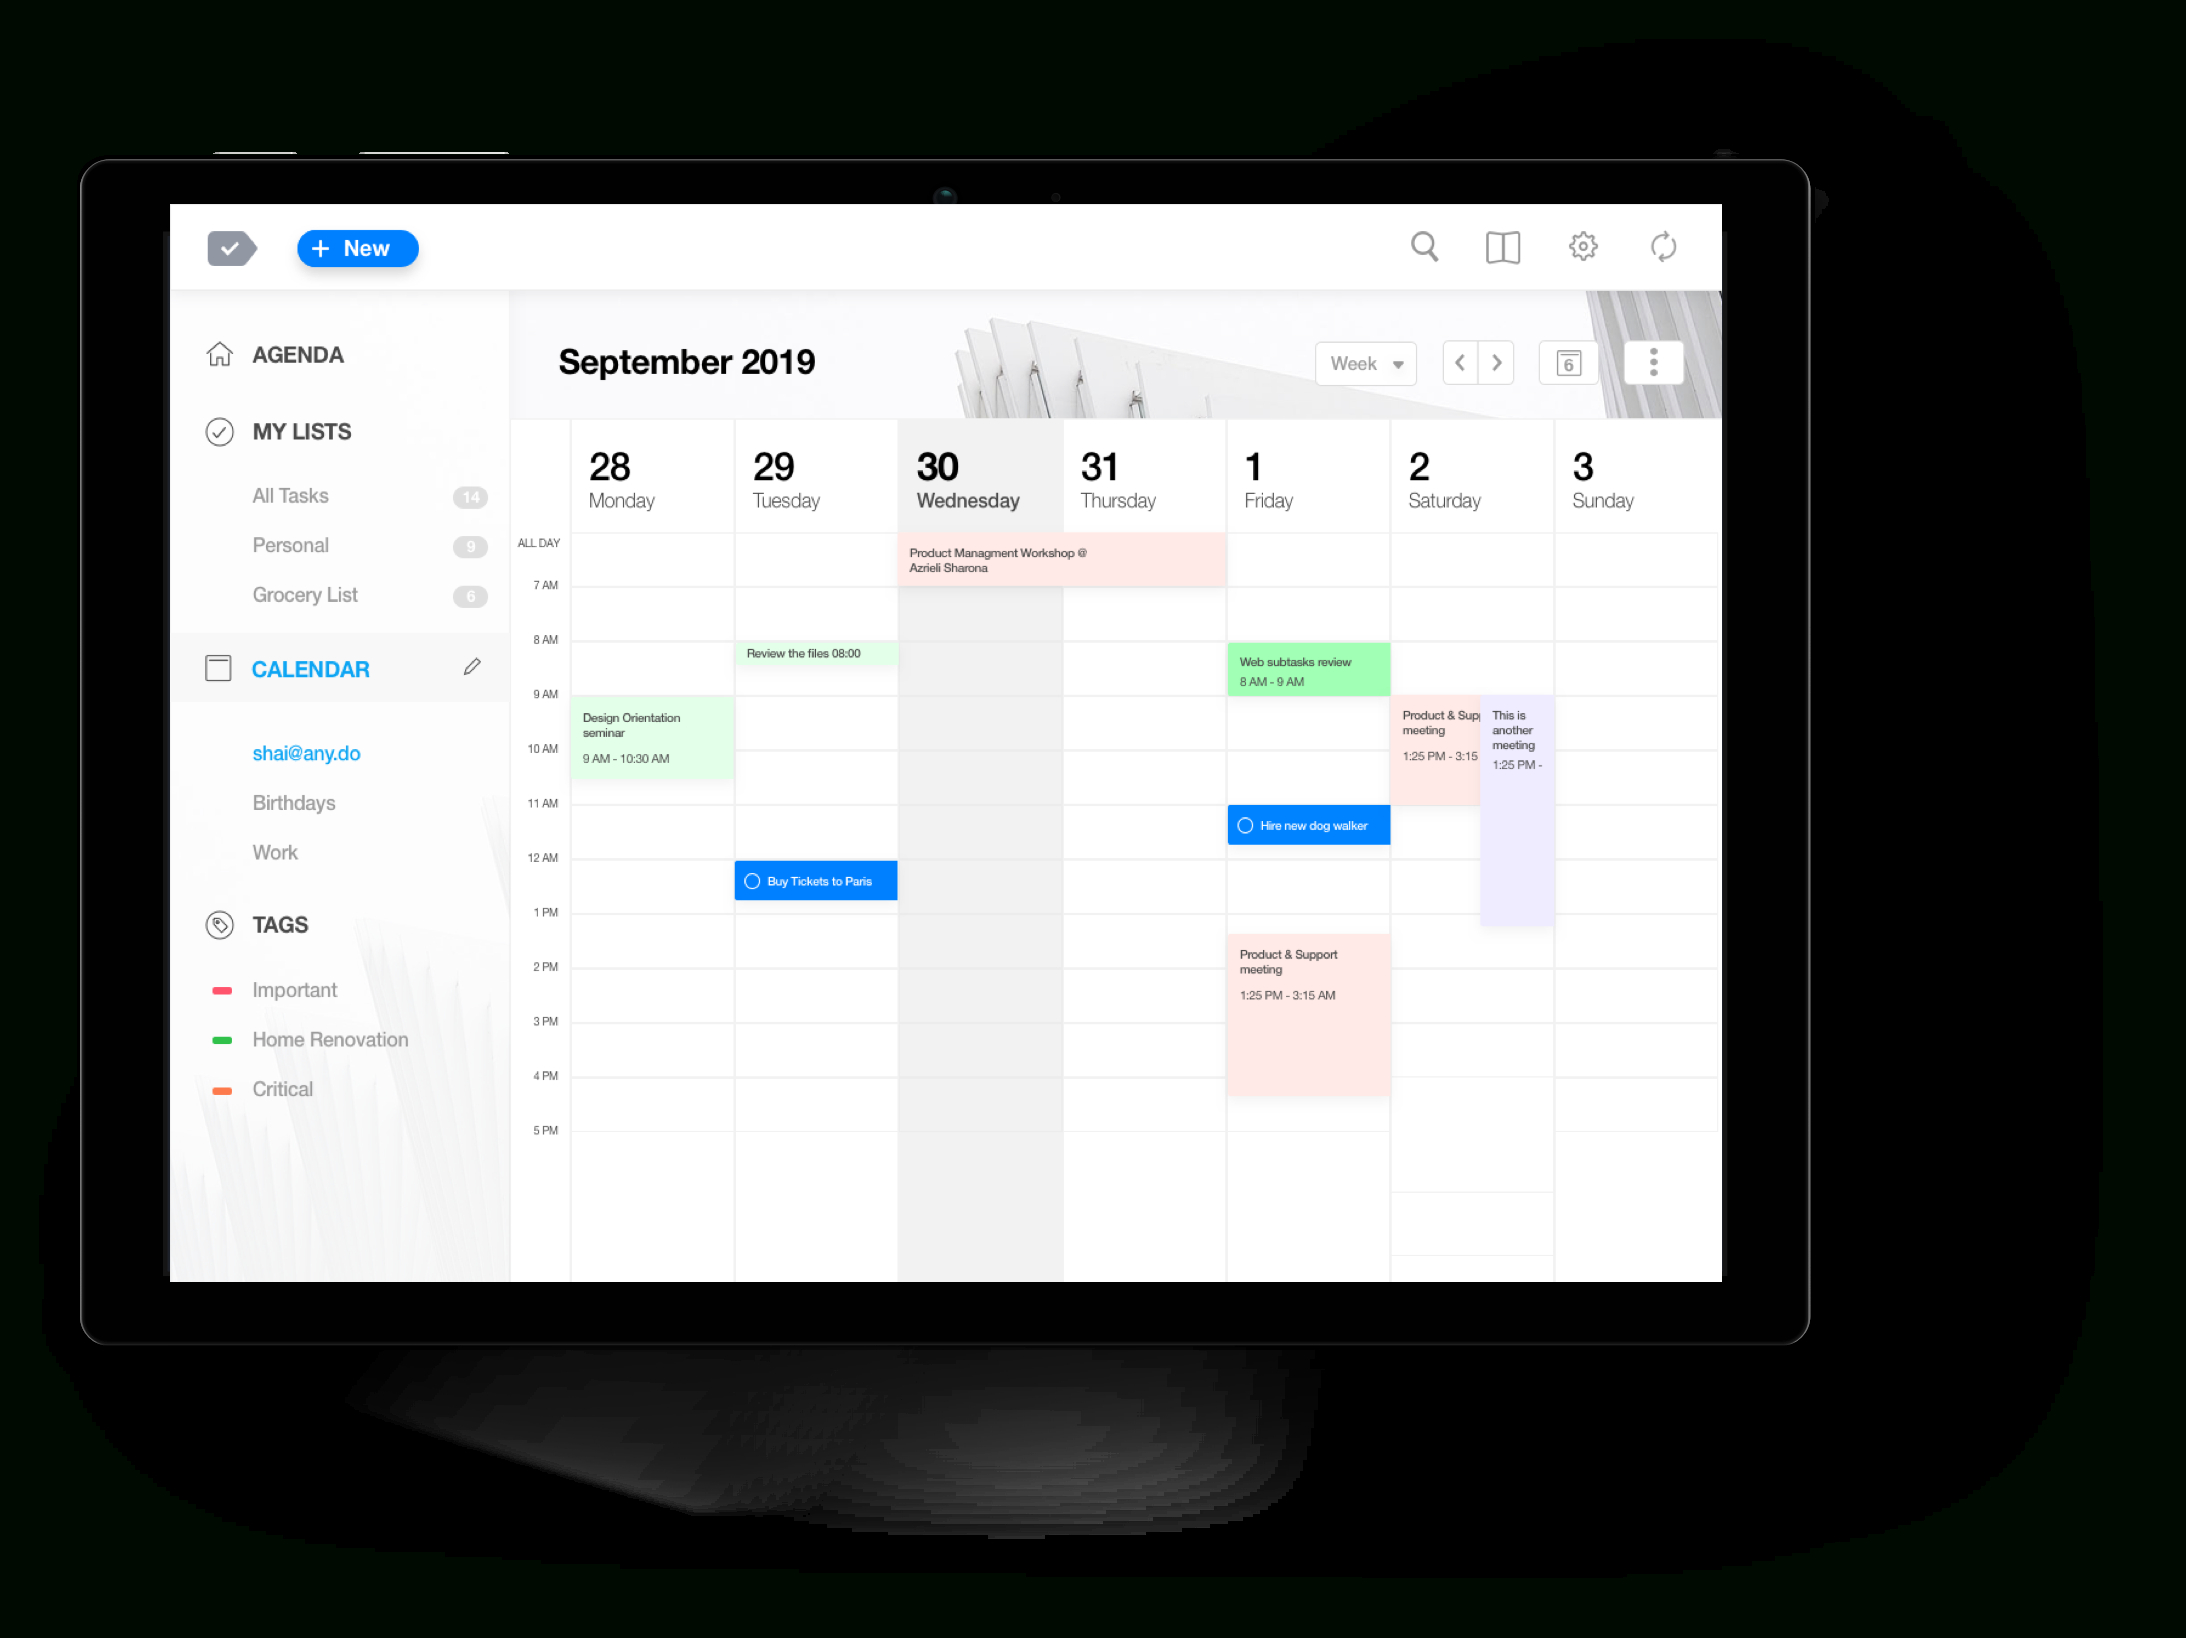 The Best Calendar App For Windows | Any.do